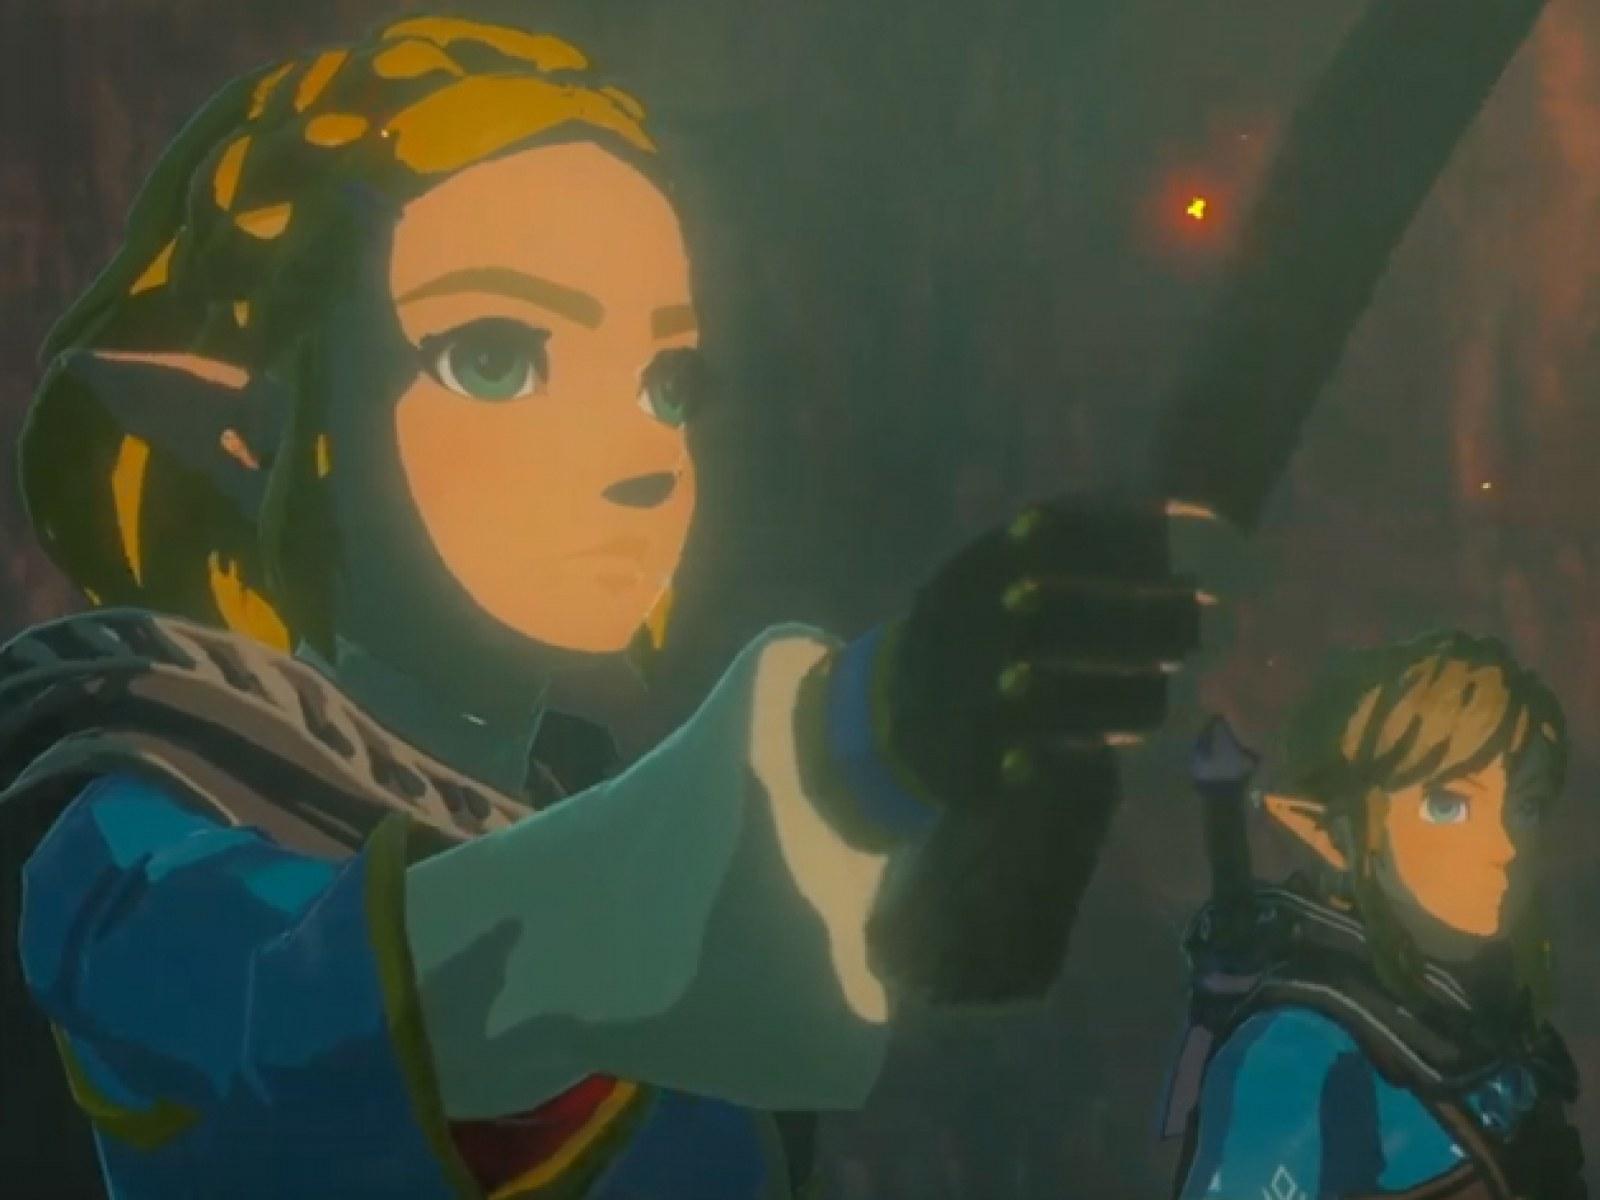 The Legend Of Zelda Breath Of The Wild Sequel Announced At E3 2019